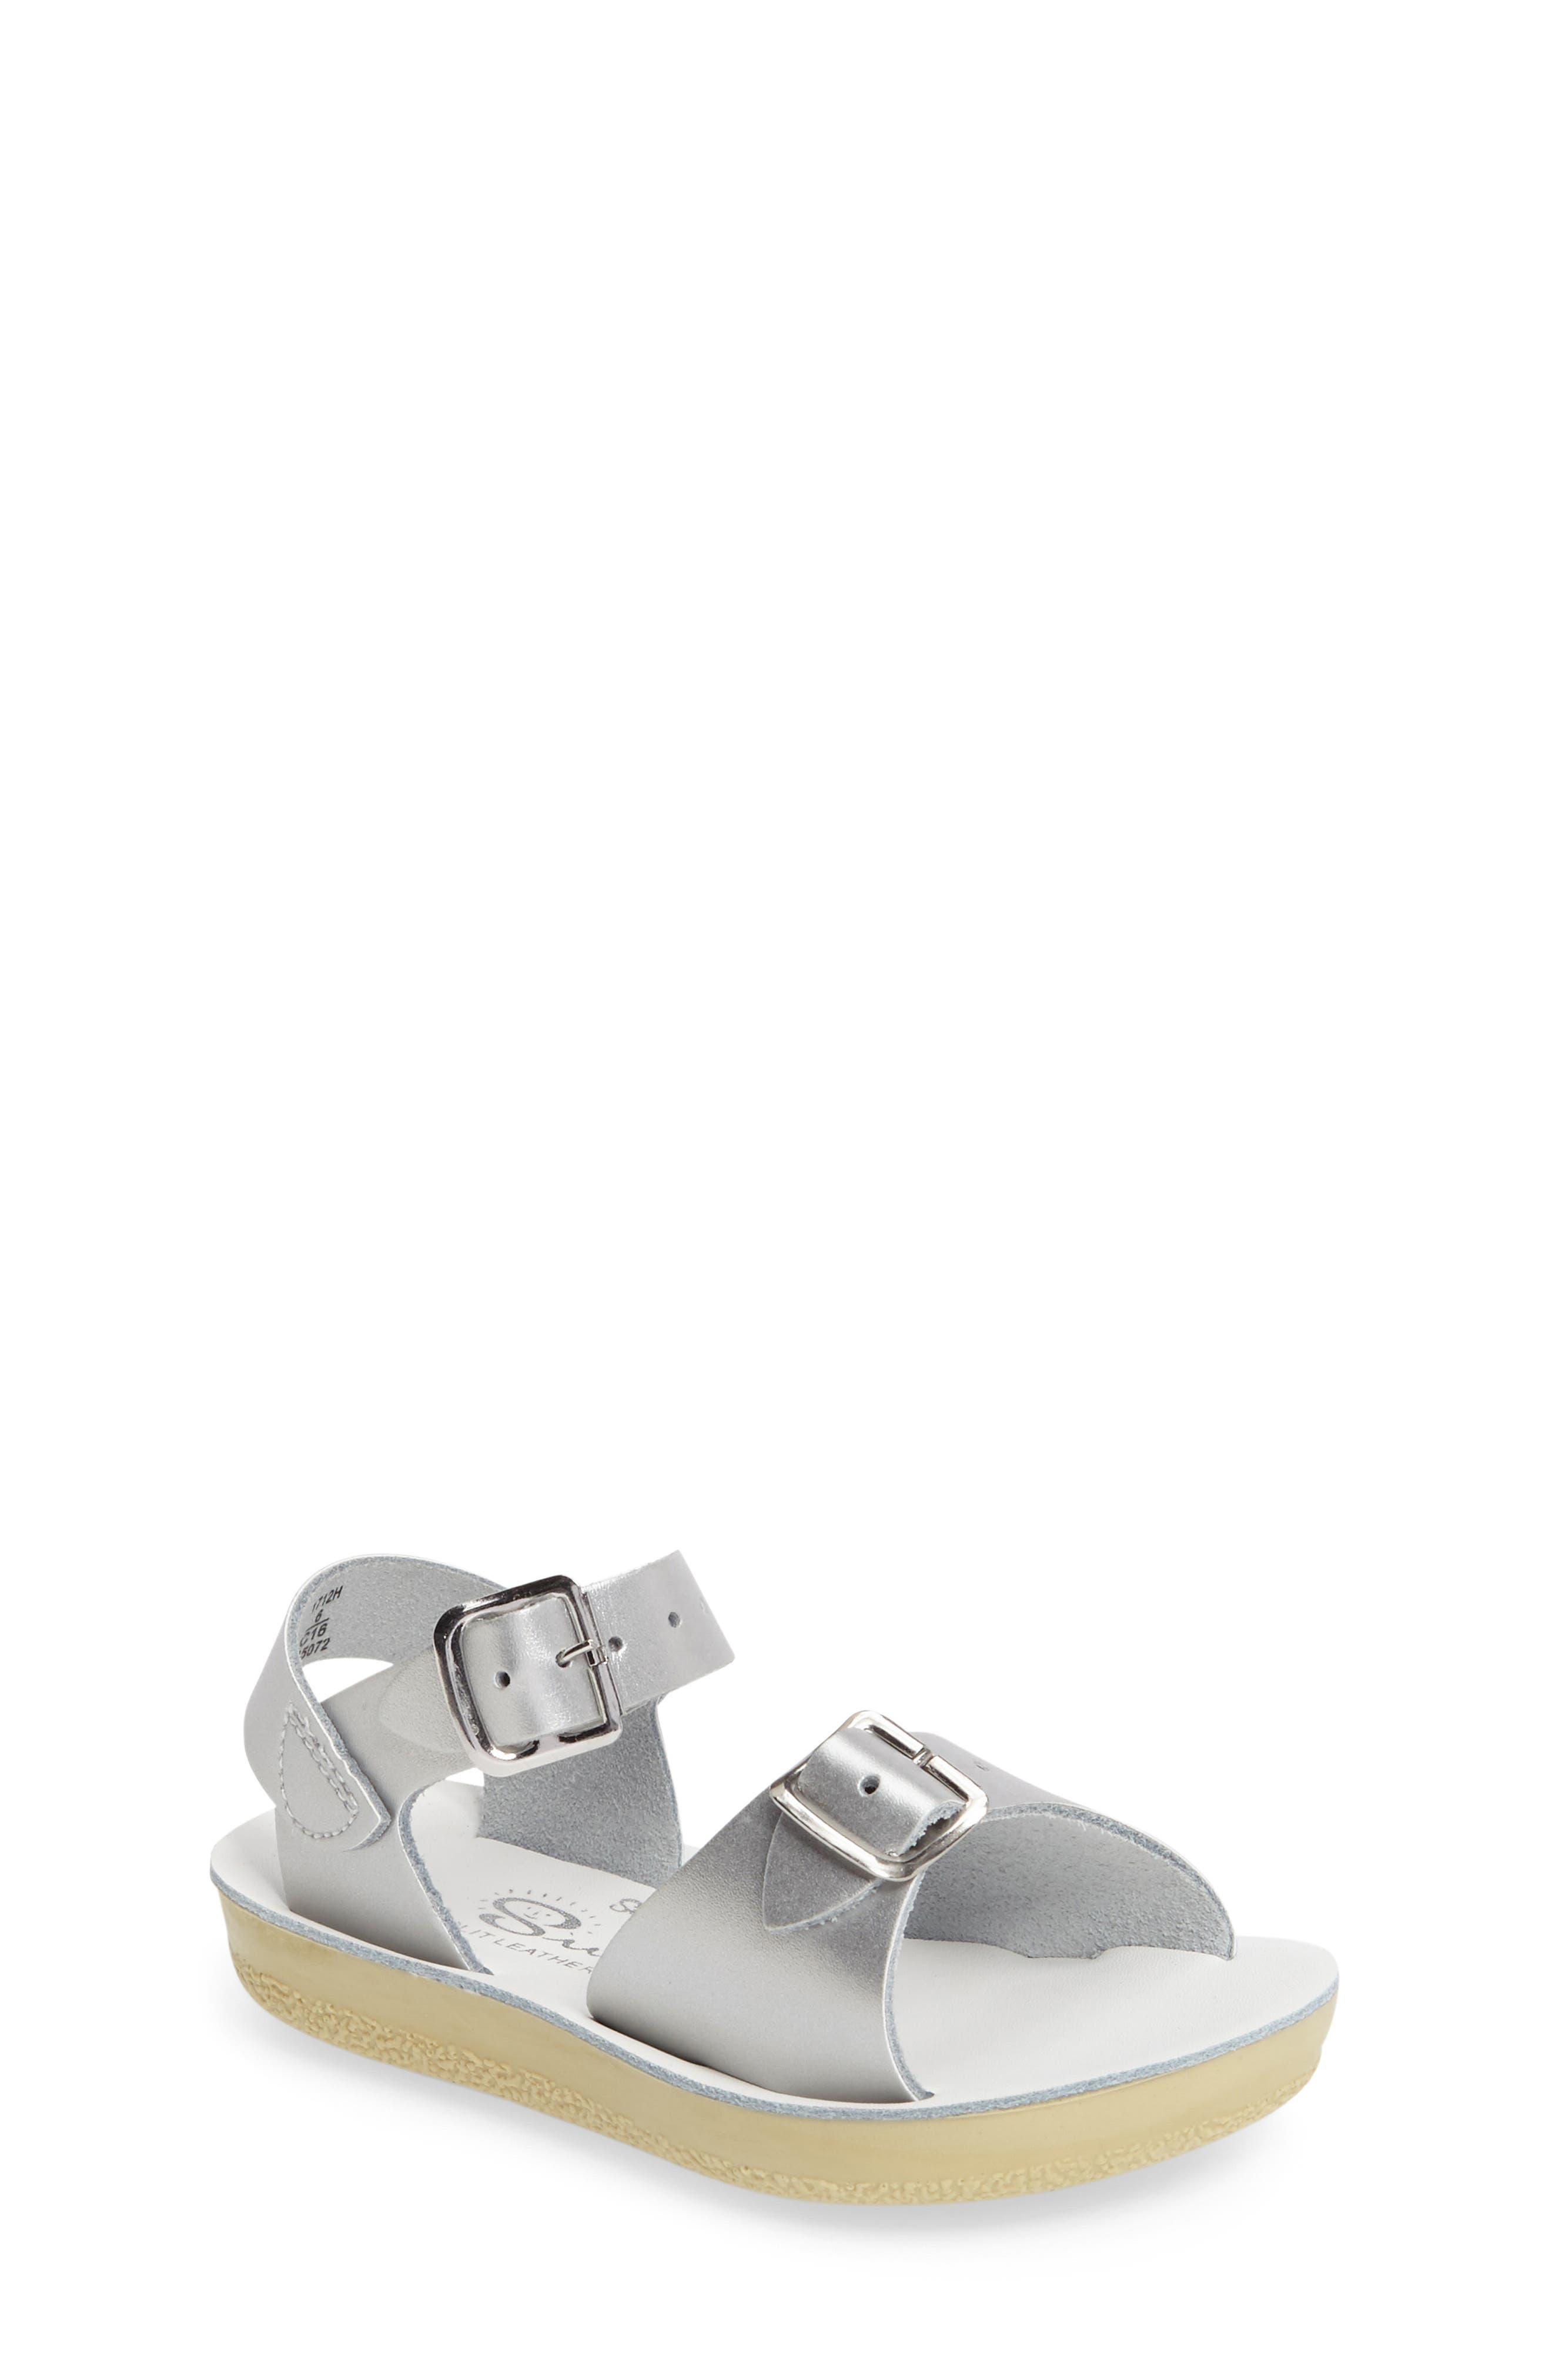 'Surfer' Sandal,                         Main,                         color, Silver